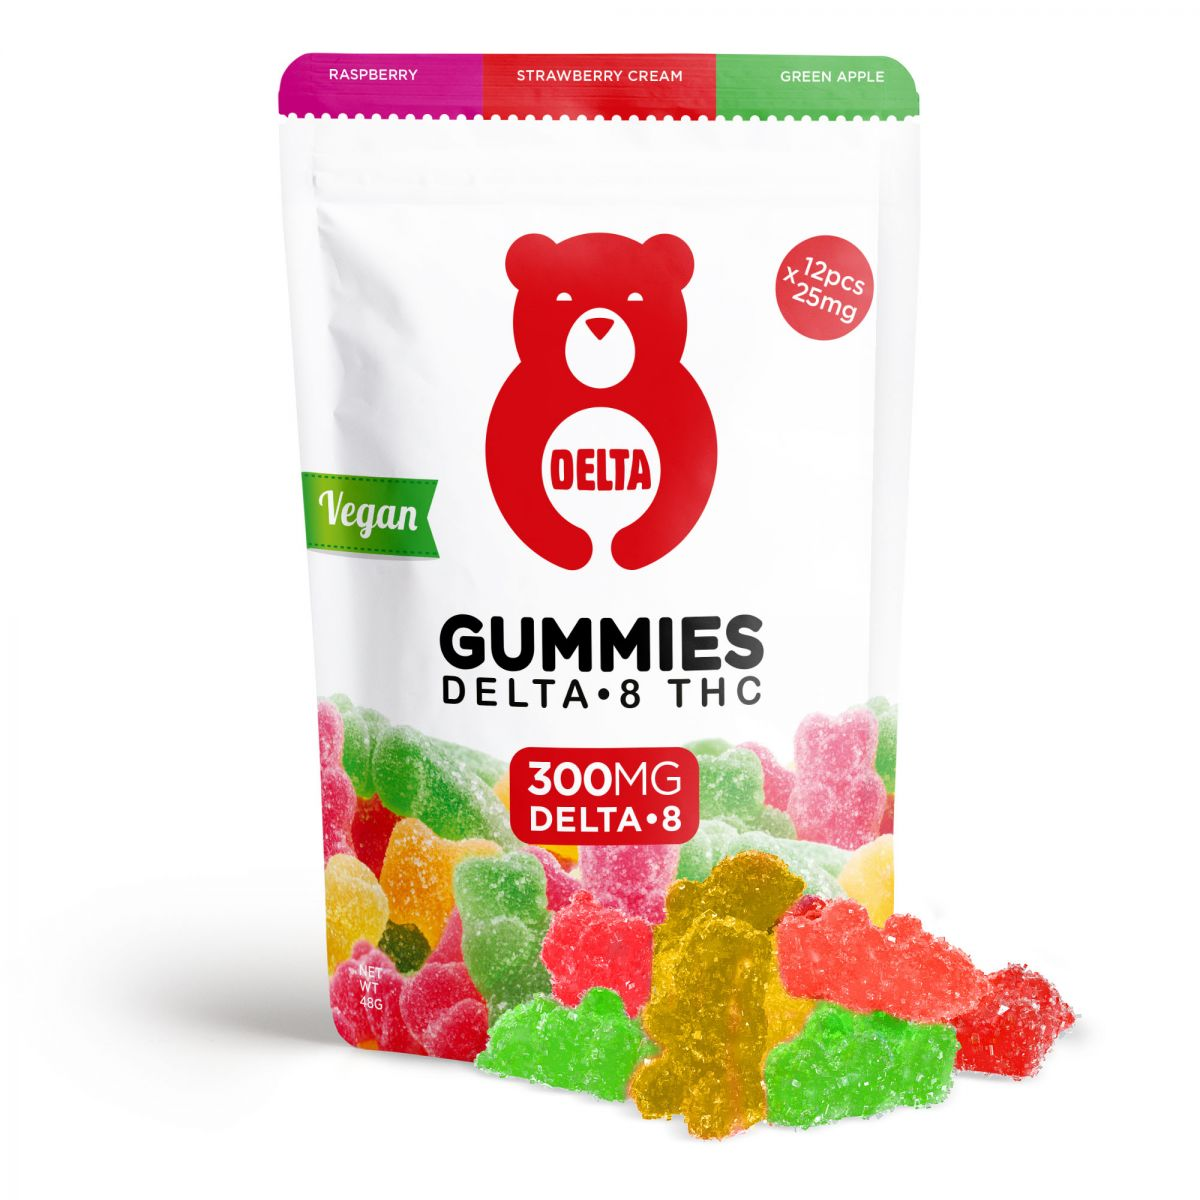 delta-8-thc-gummy-bears-vegan-red-bear-assortment-raspberry-strawberry-cream-green-apple-300mg_0